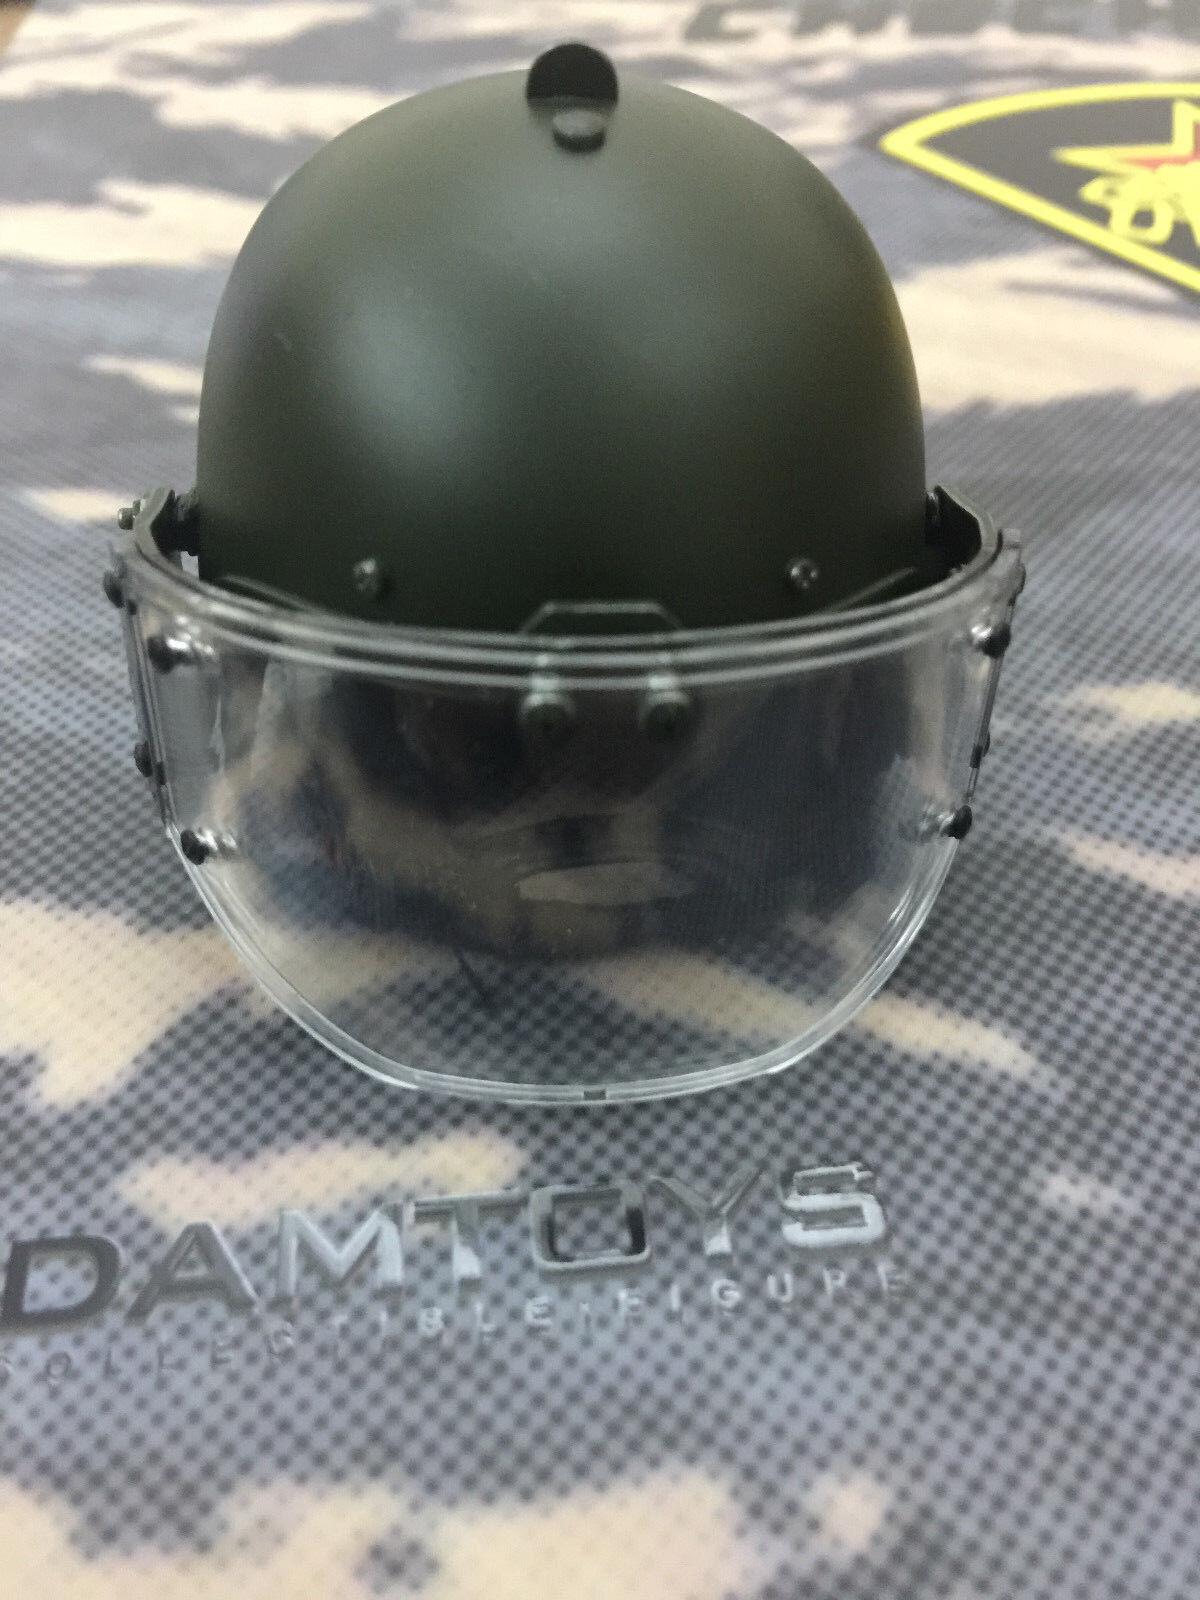 Damtoys Russian Spetsnaz MVD Vityaz 78028 - 1 6th scale scale scale Helmet Set 779ae1